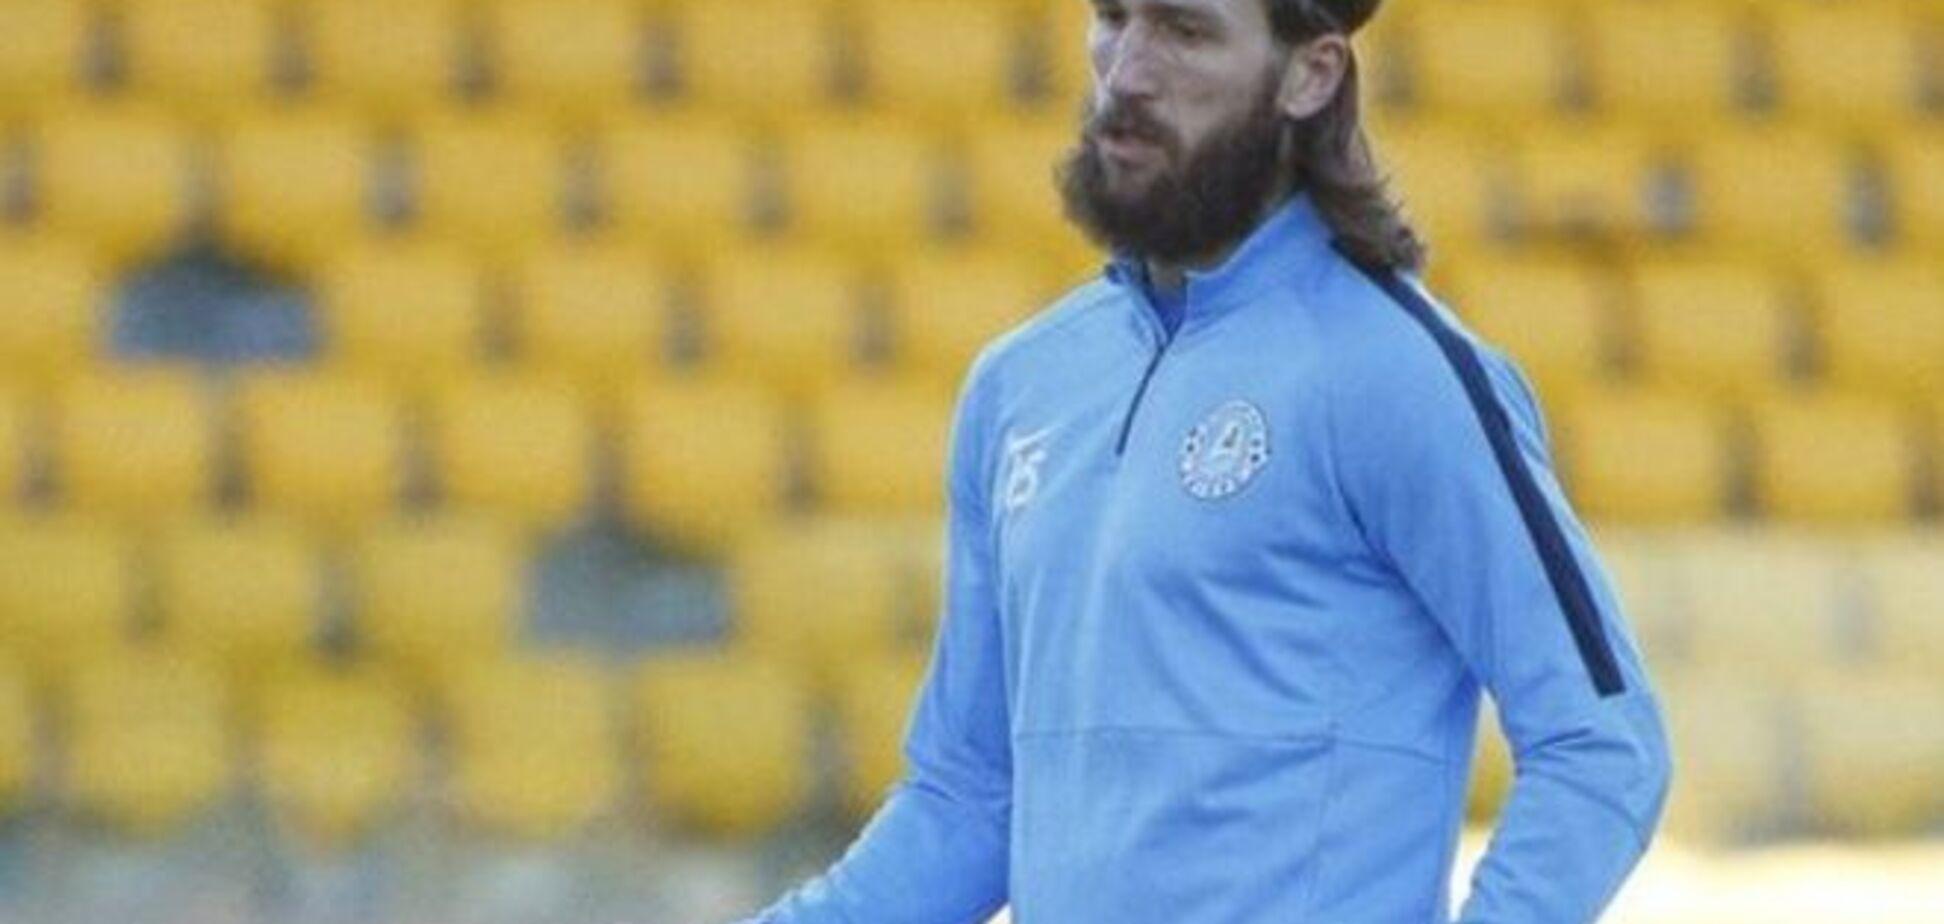 Футболист 'Днепра' переходит в турецкий гранд - СМИ